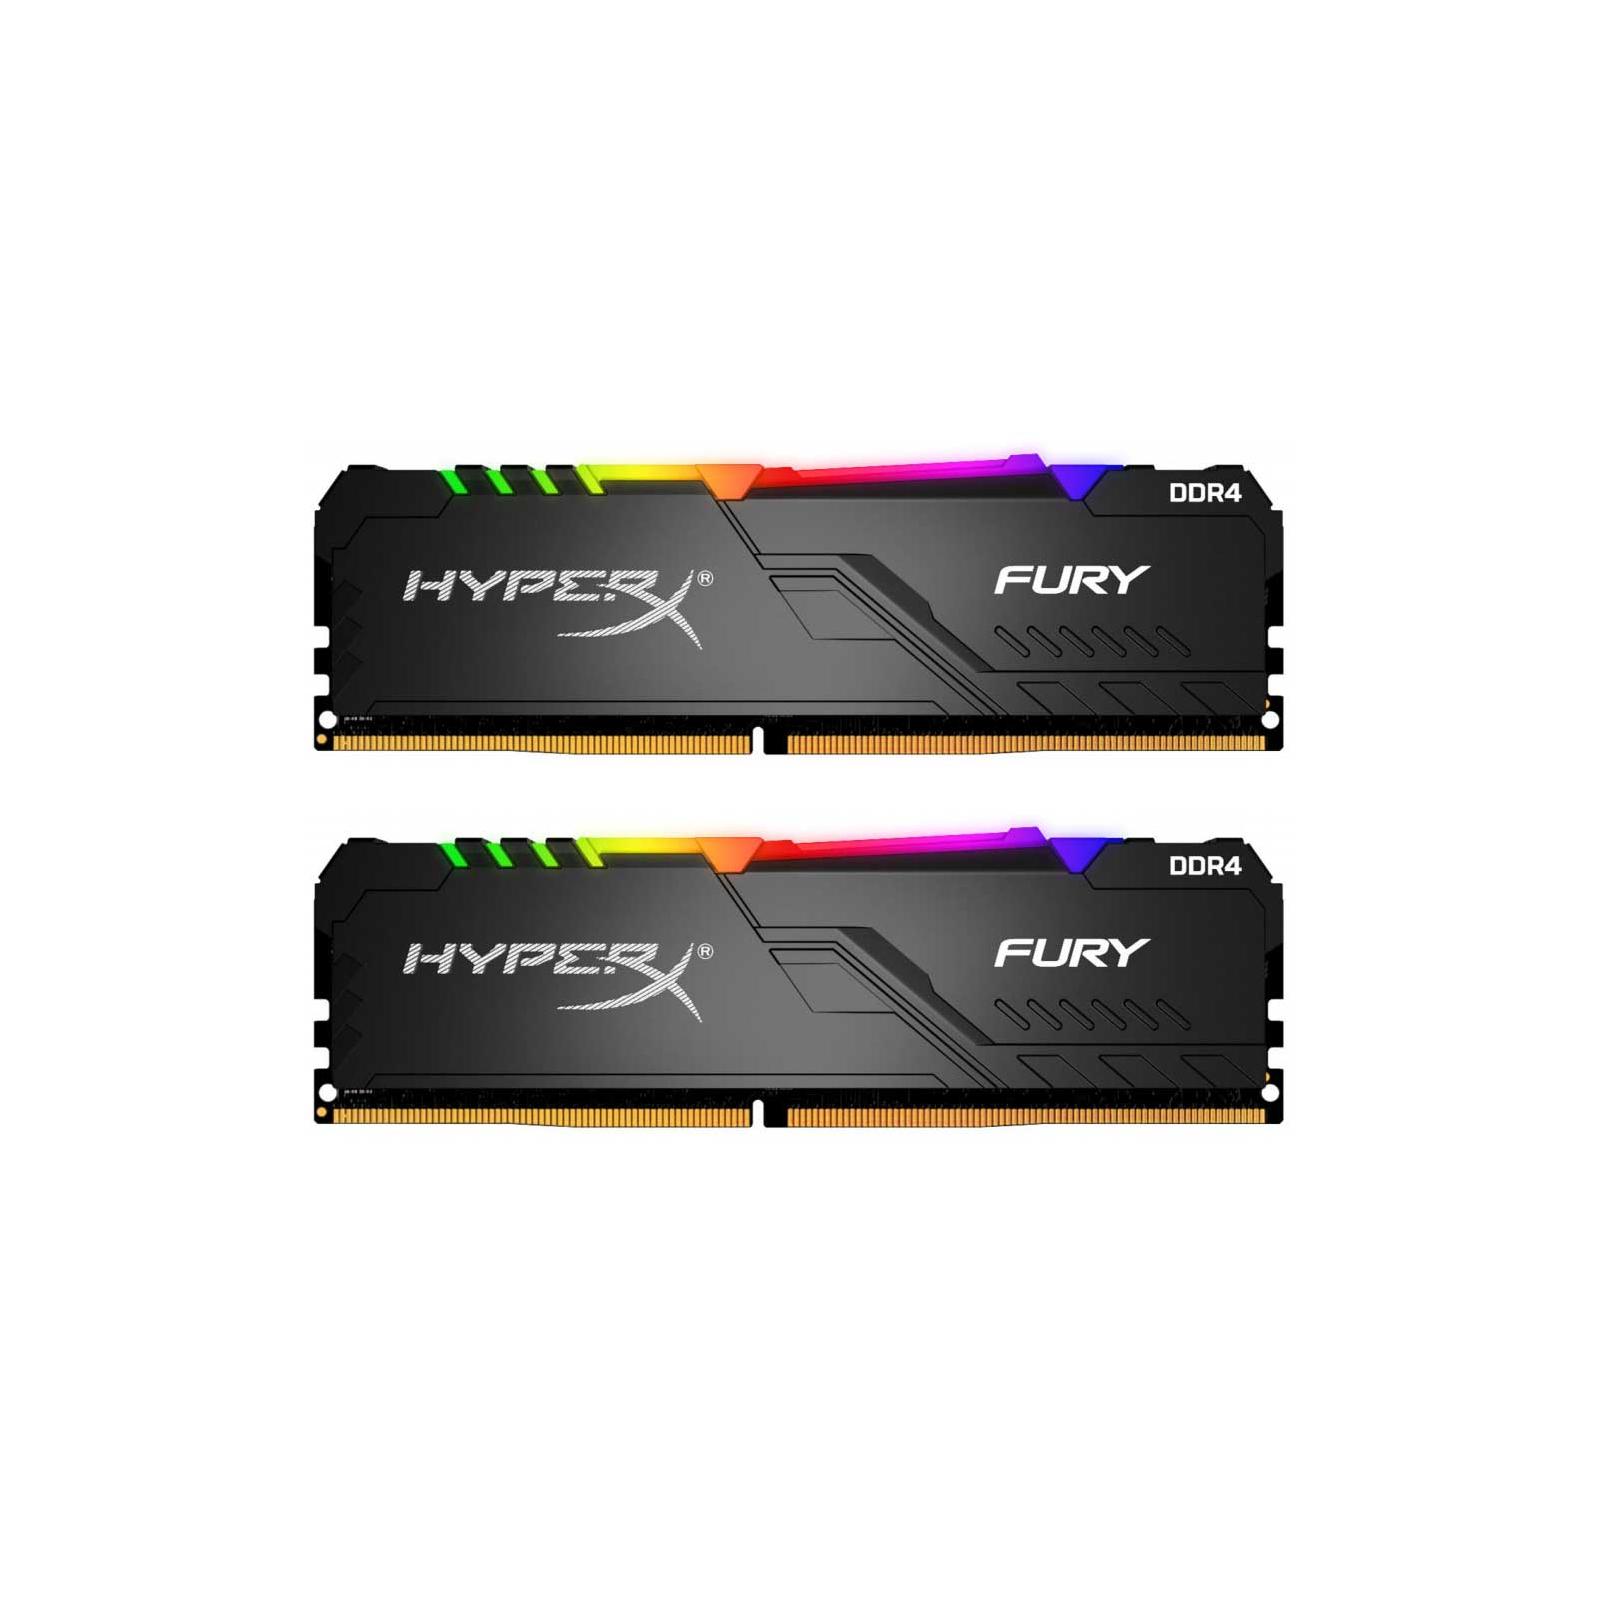 Модуль памяти для компьютера DDR4 32GB (2x16GB) 3466 MHz HyperX FURY RGB HyperX (Kingston Fury) (HX434C16FB3AK2/32)